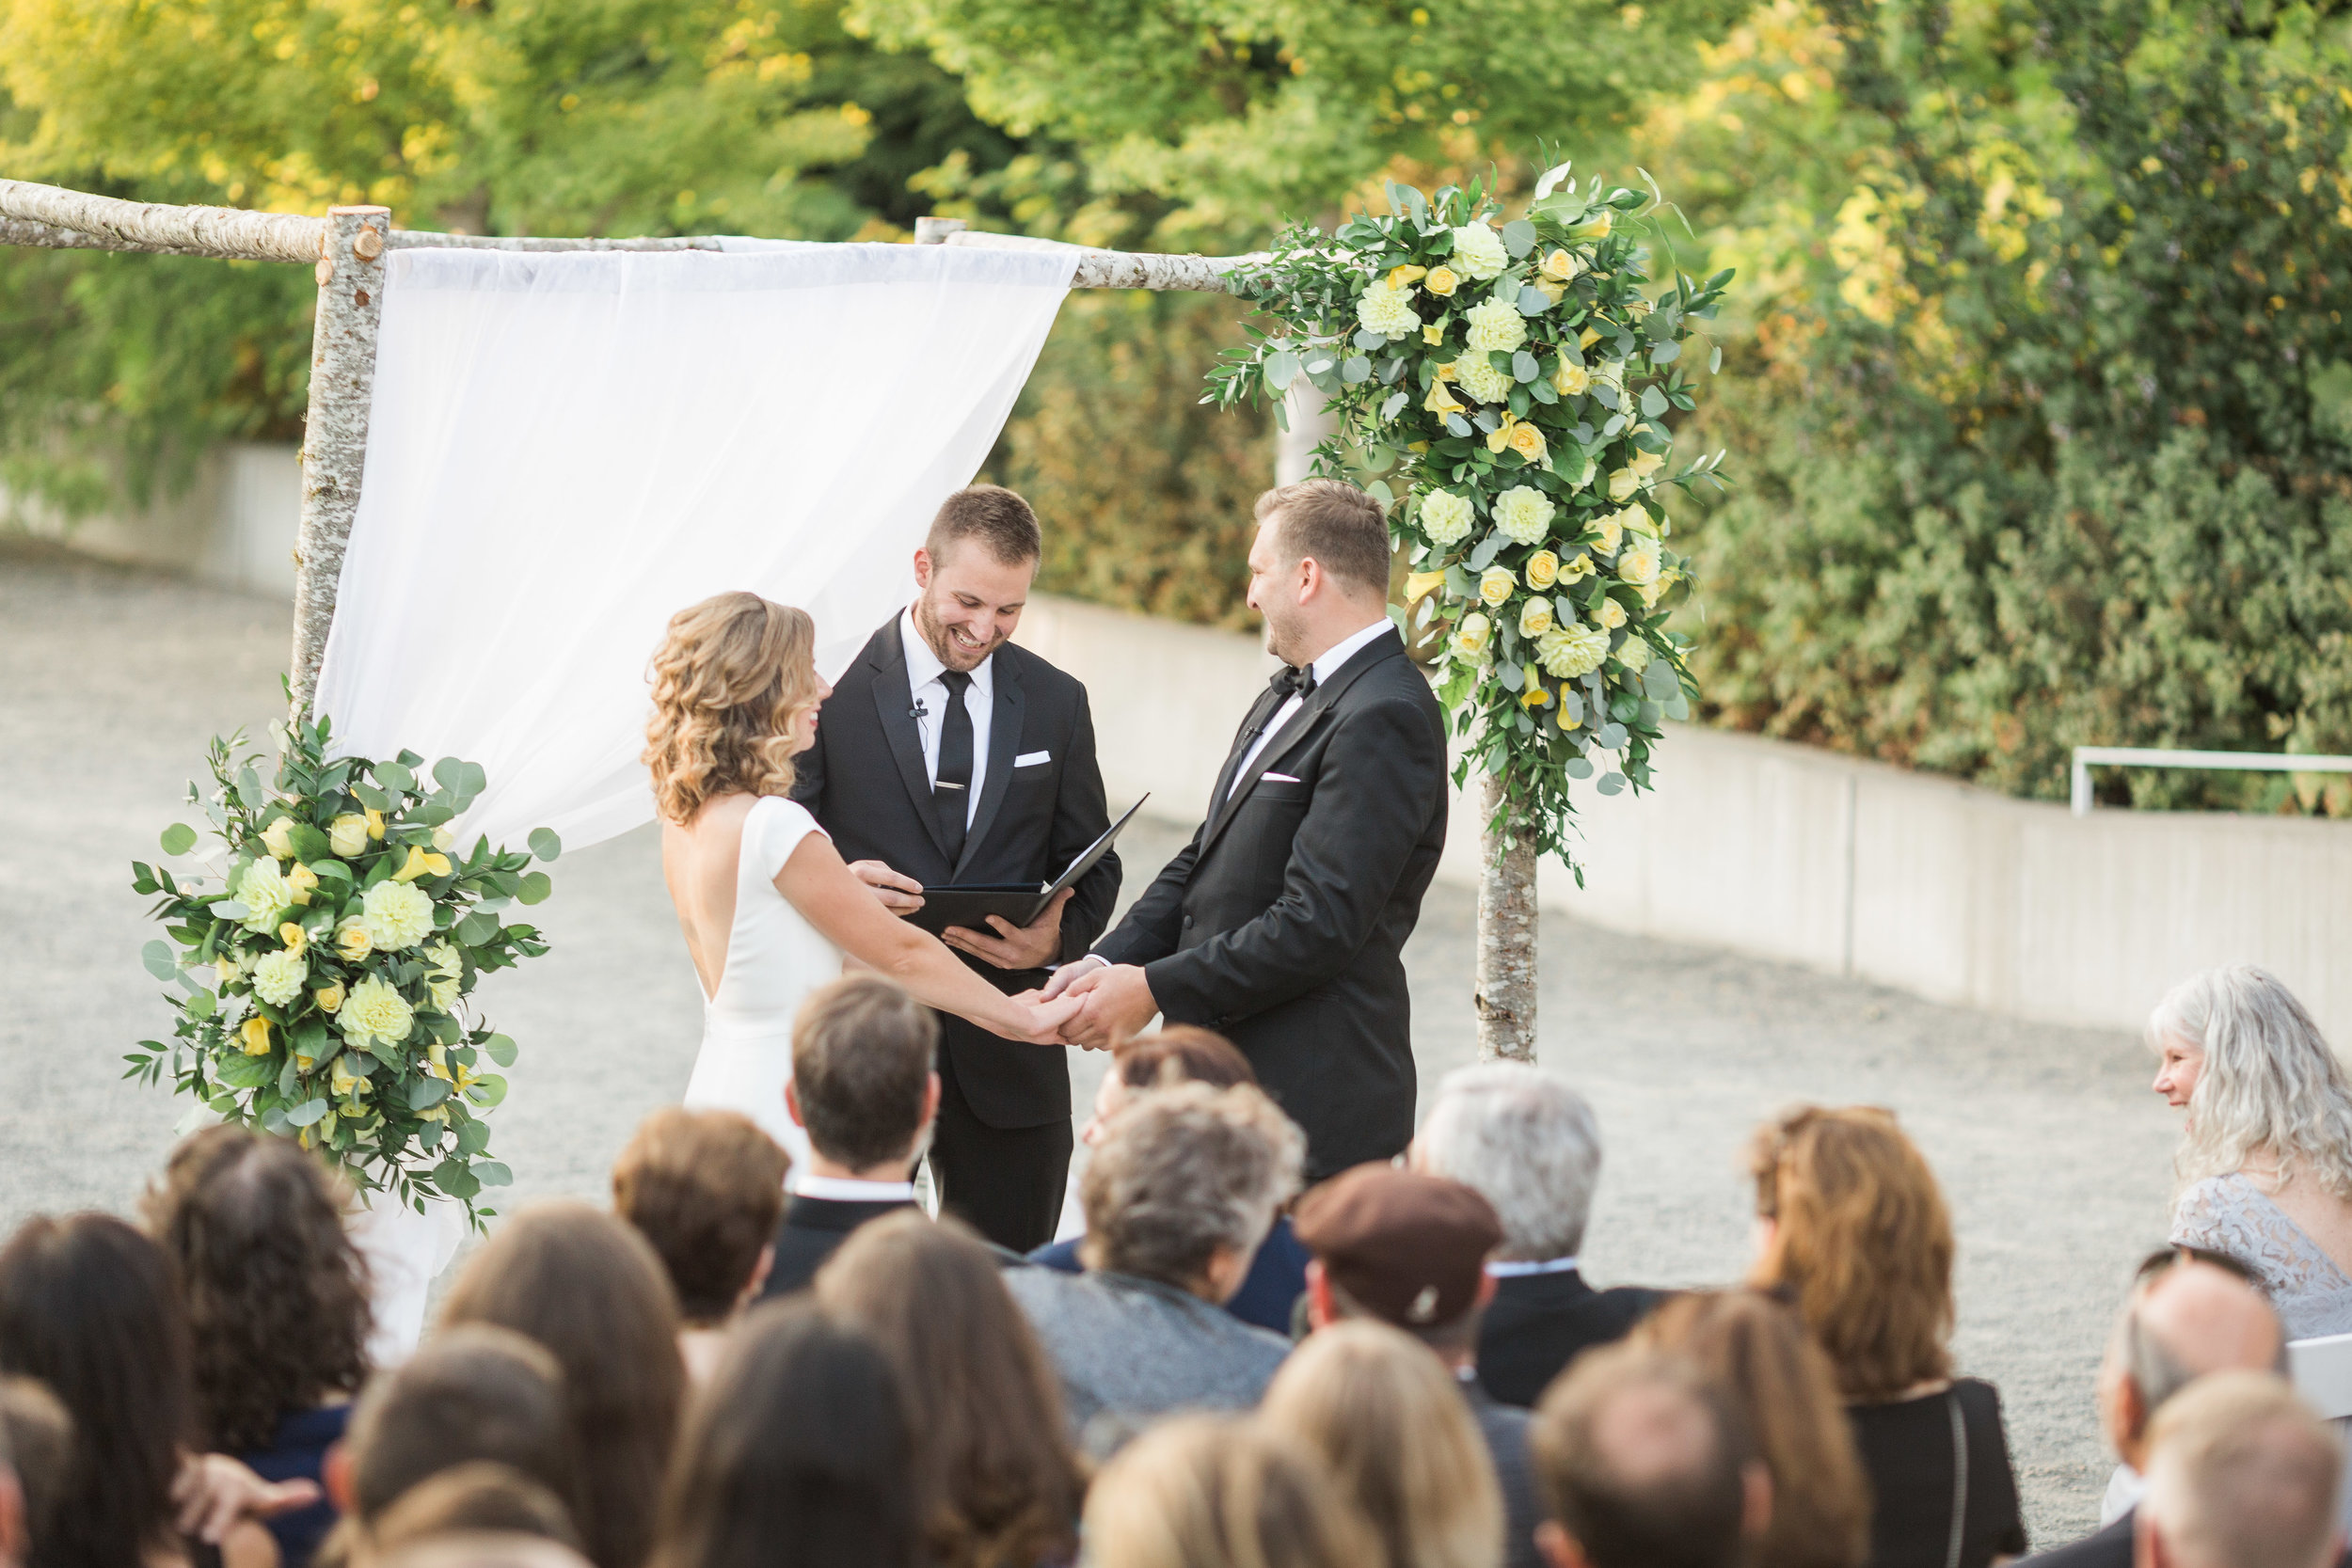 seattle-wedding-northwest-ceremony-chuppah-modern-yellow-floral-greenery